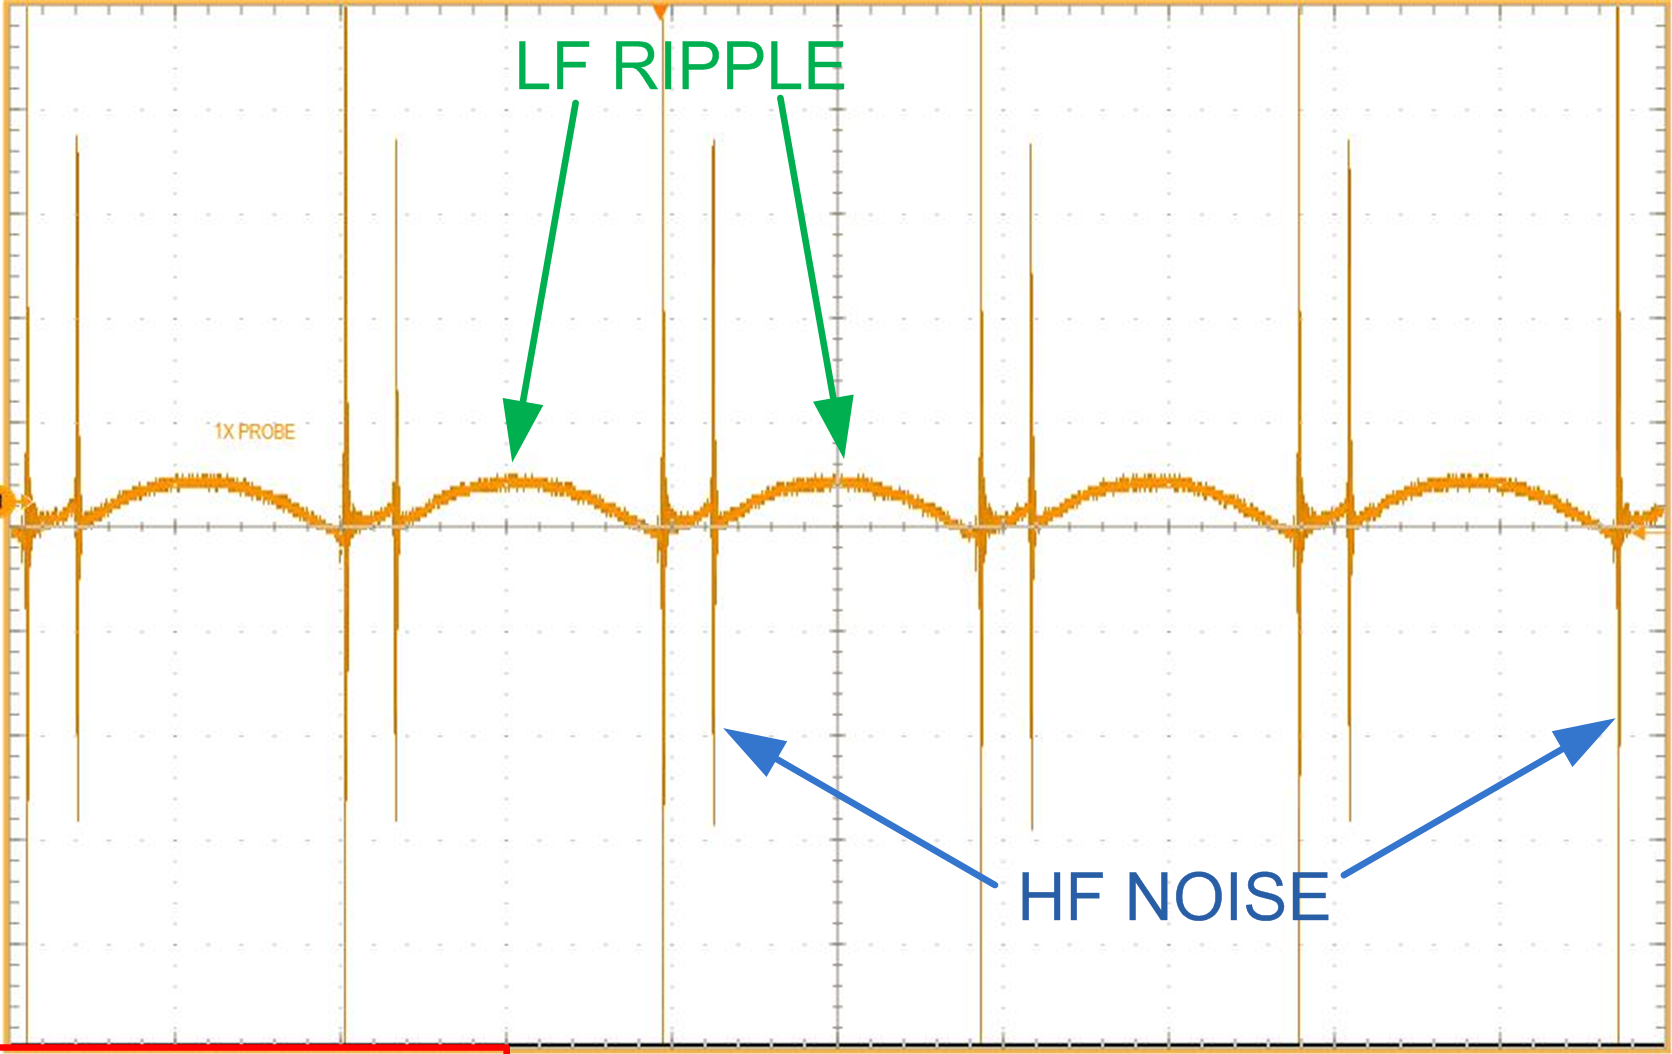 ریپل ولتاژ یا جریان خروجی Vr